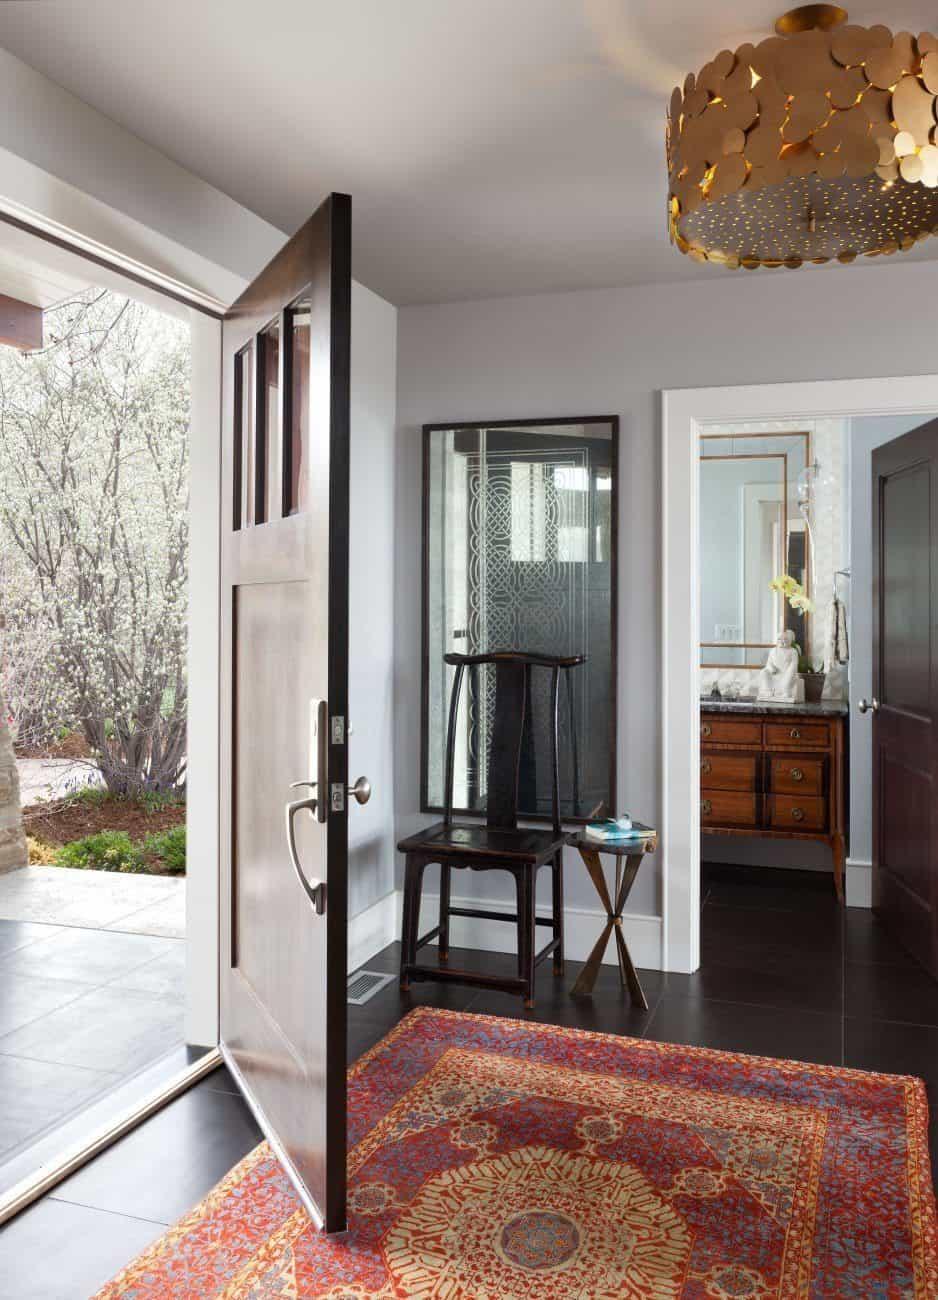 Boulder Residence-Andrea Schumacher Interiors-08-1 Kindesign